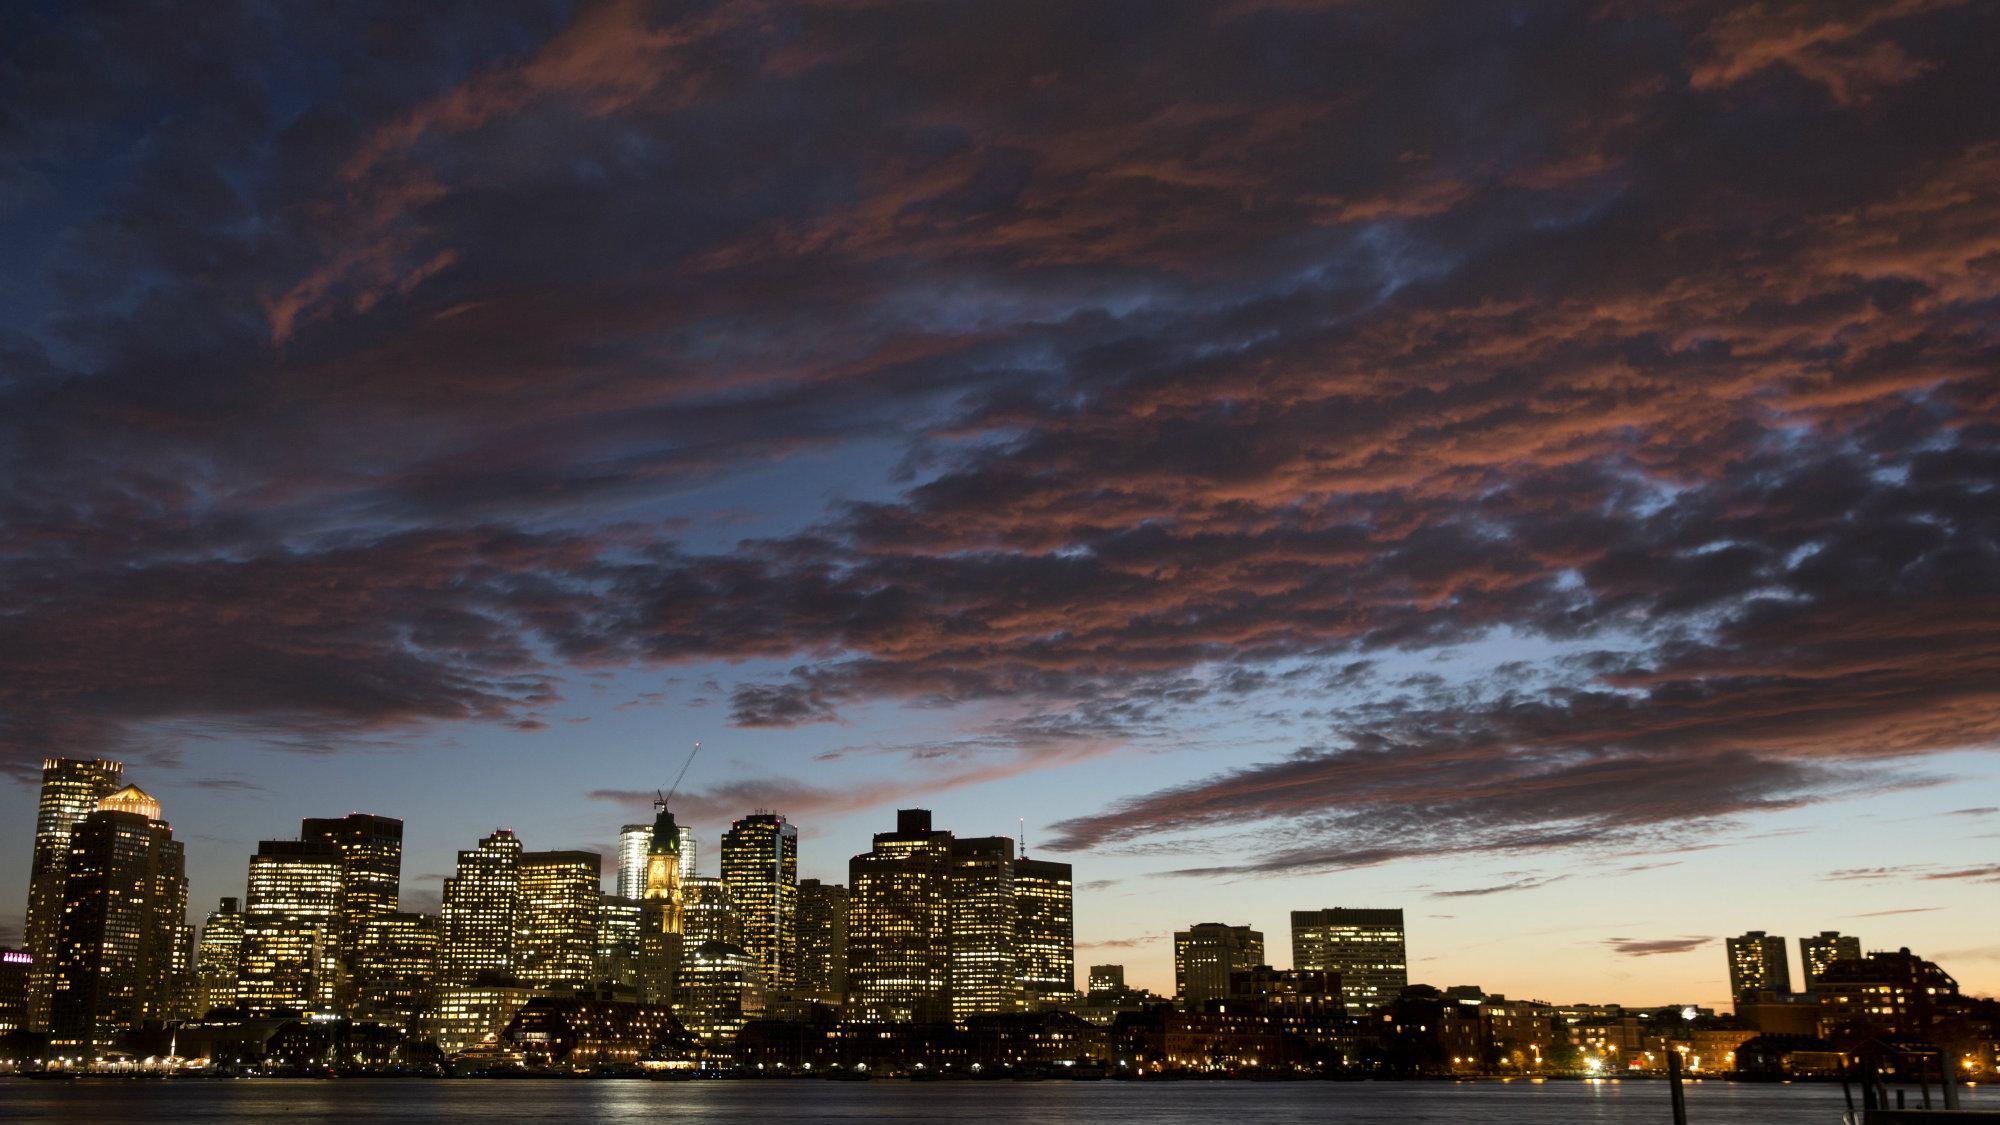 The sunset illuminates clouds over Boston harbor and the city skyline